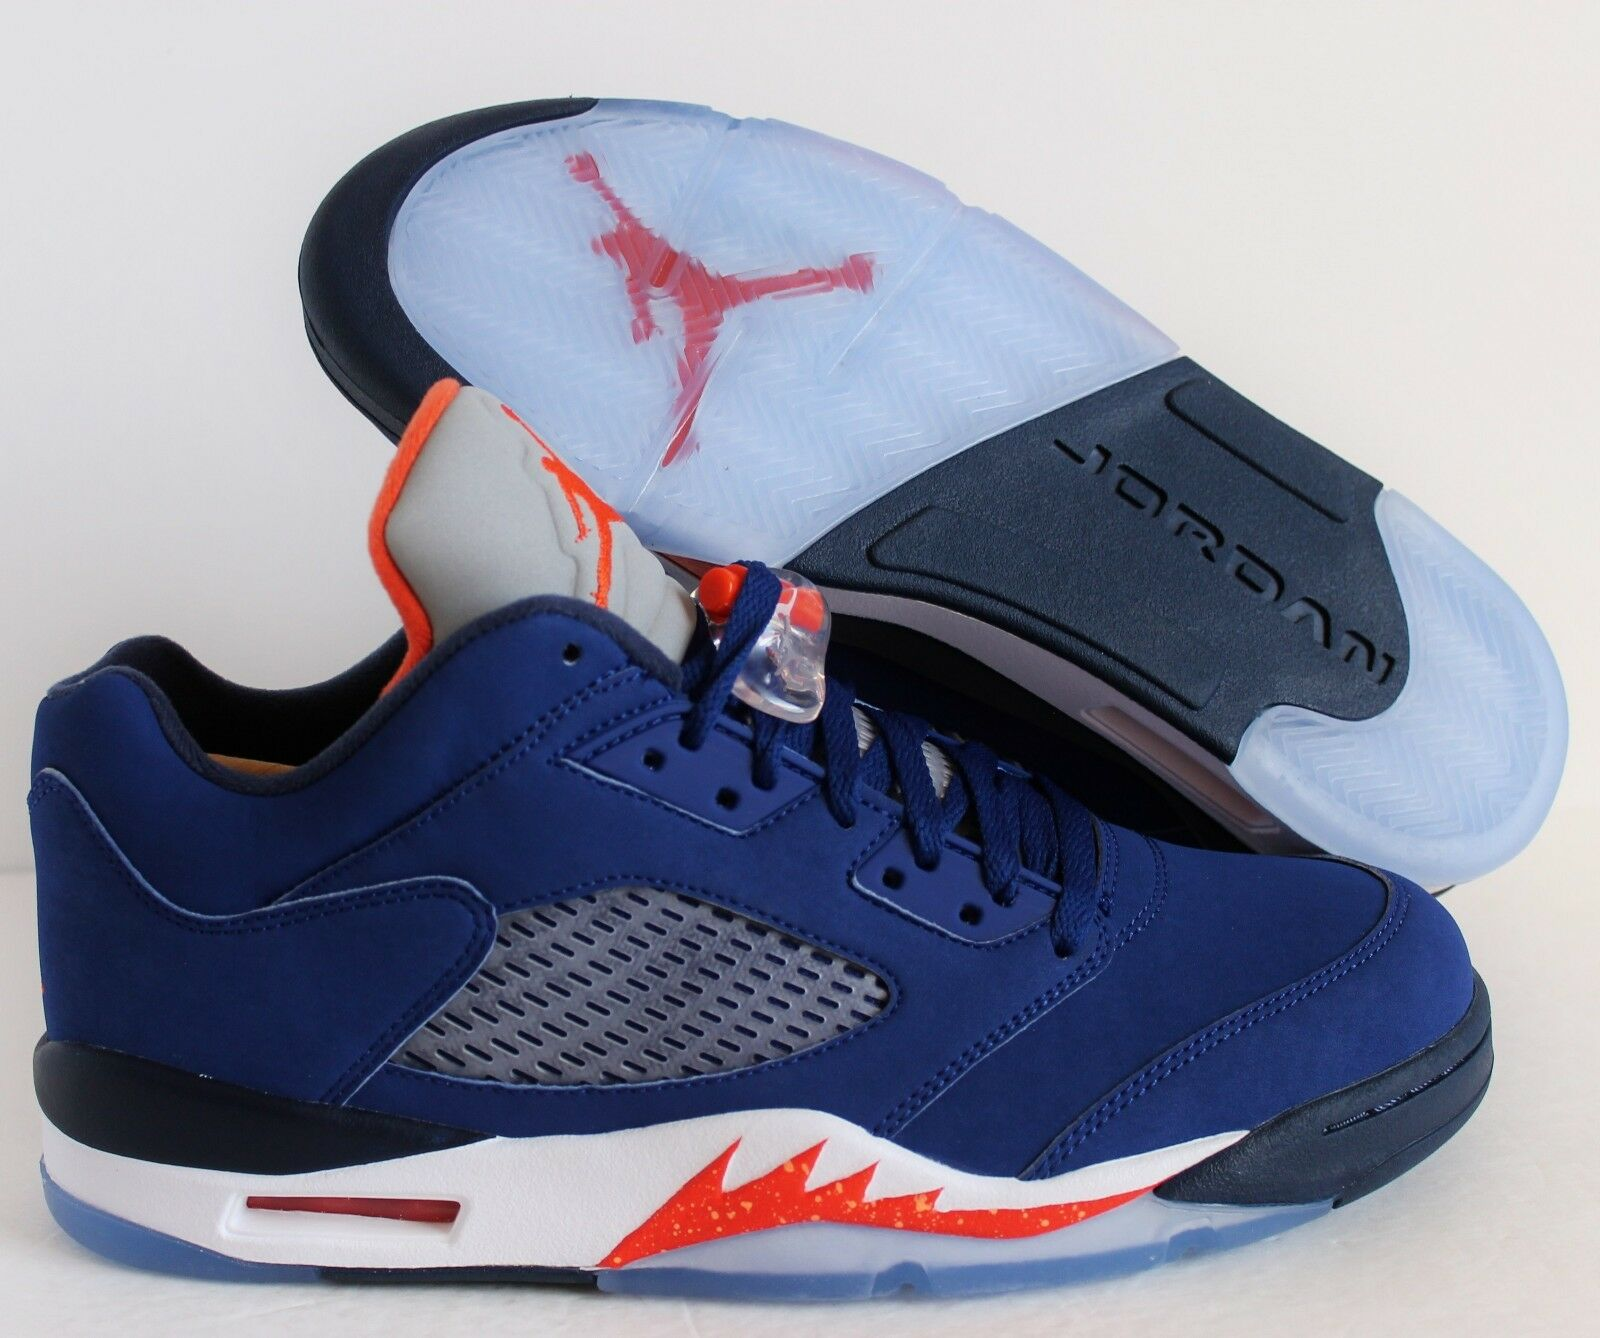 Nike Air Jordan 5 V Retro Low 'Knicks' 'Knicks' Low Royal Bleu-Orange sz 14 04d1f7